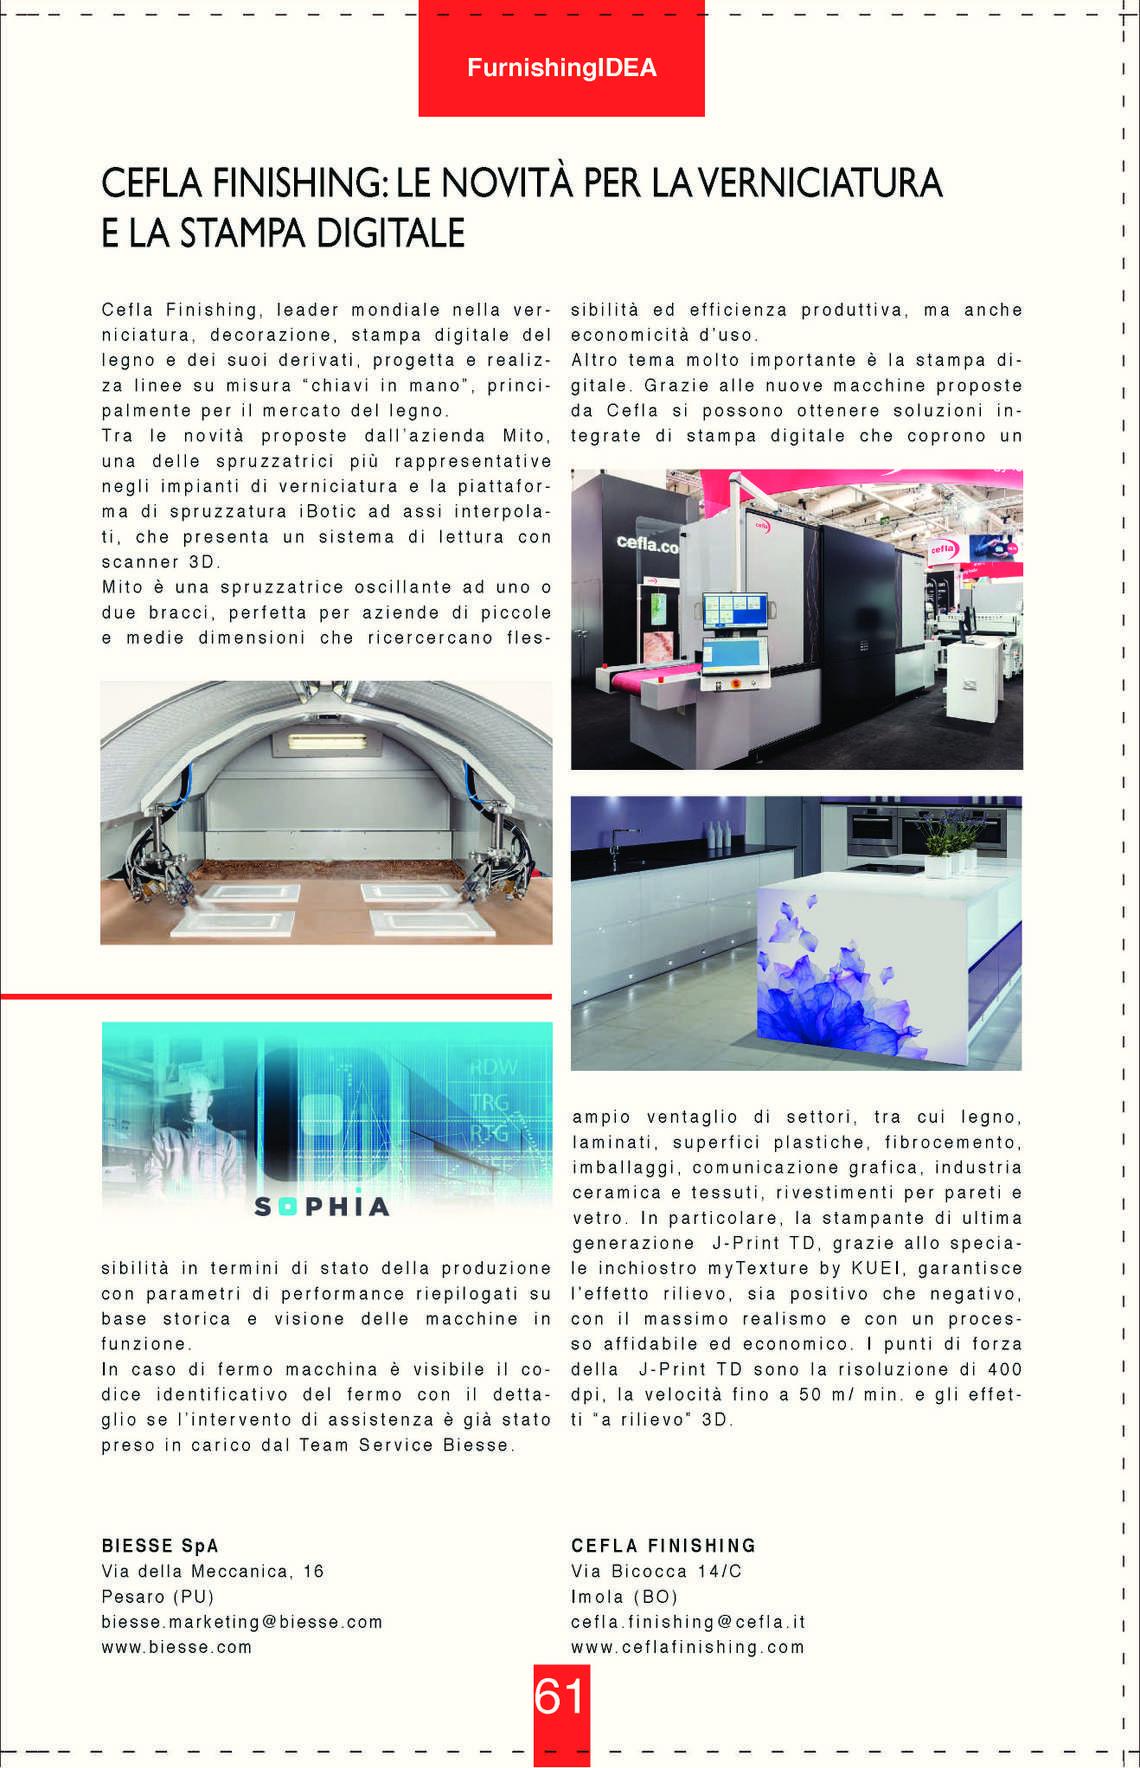 furnishing-idea-journal--1-2018_journal_9_060.jpg